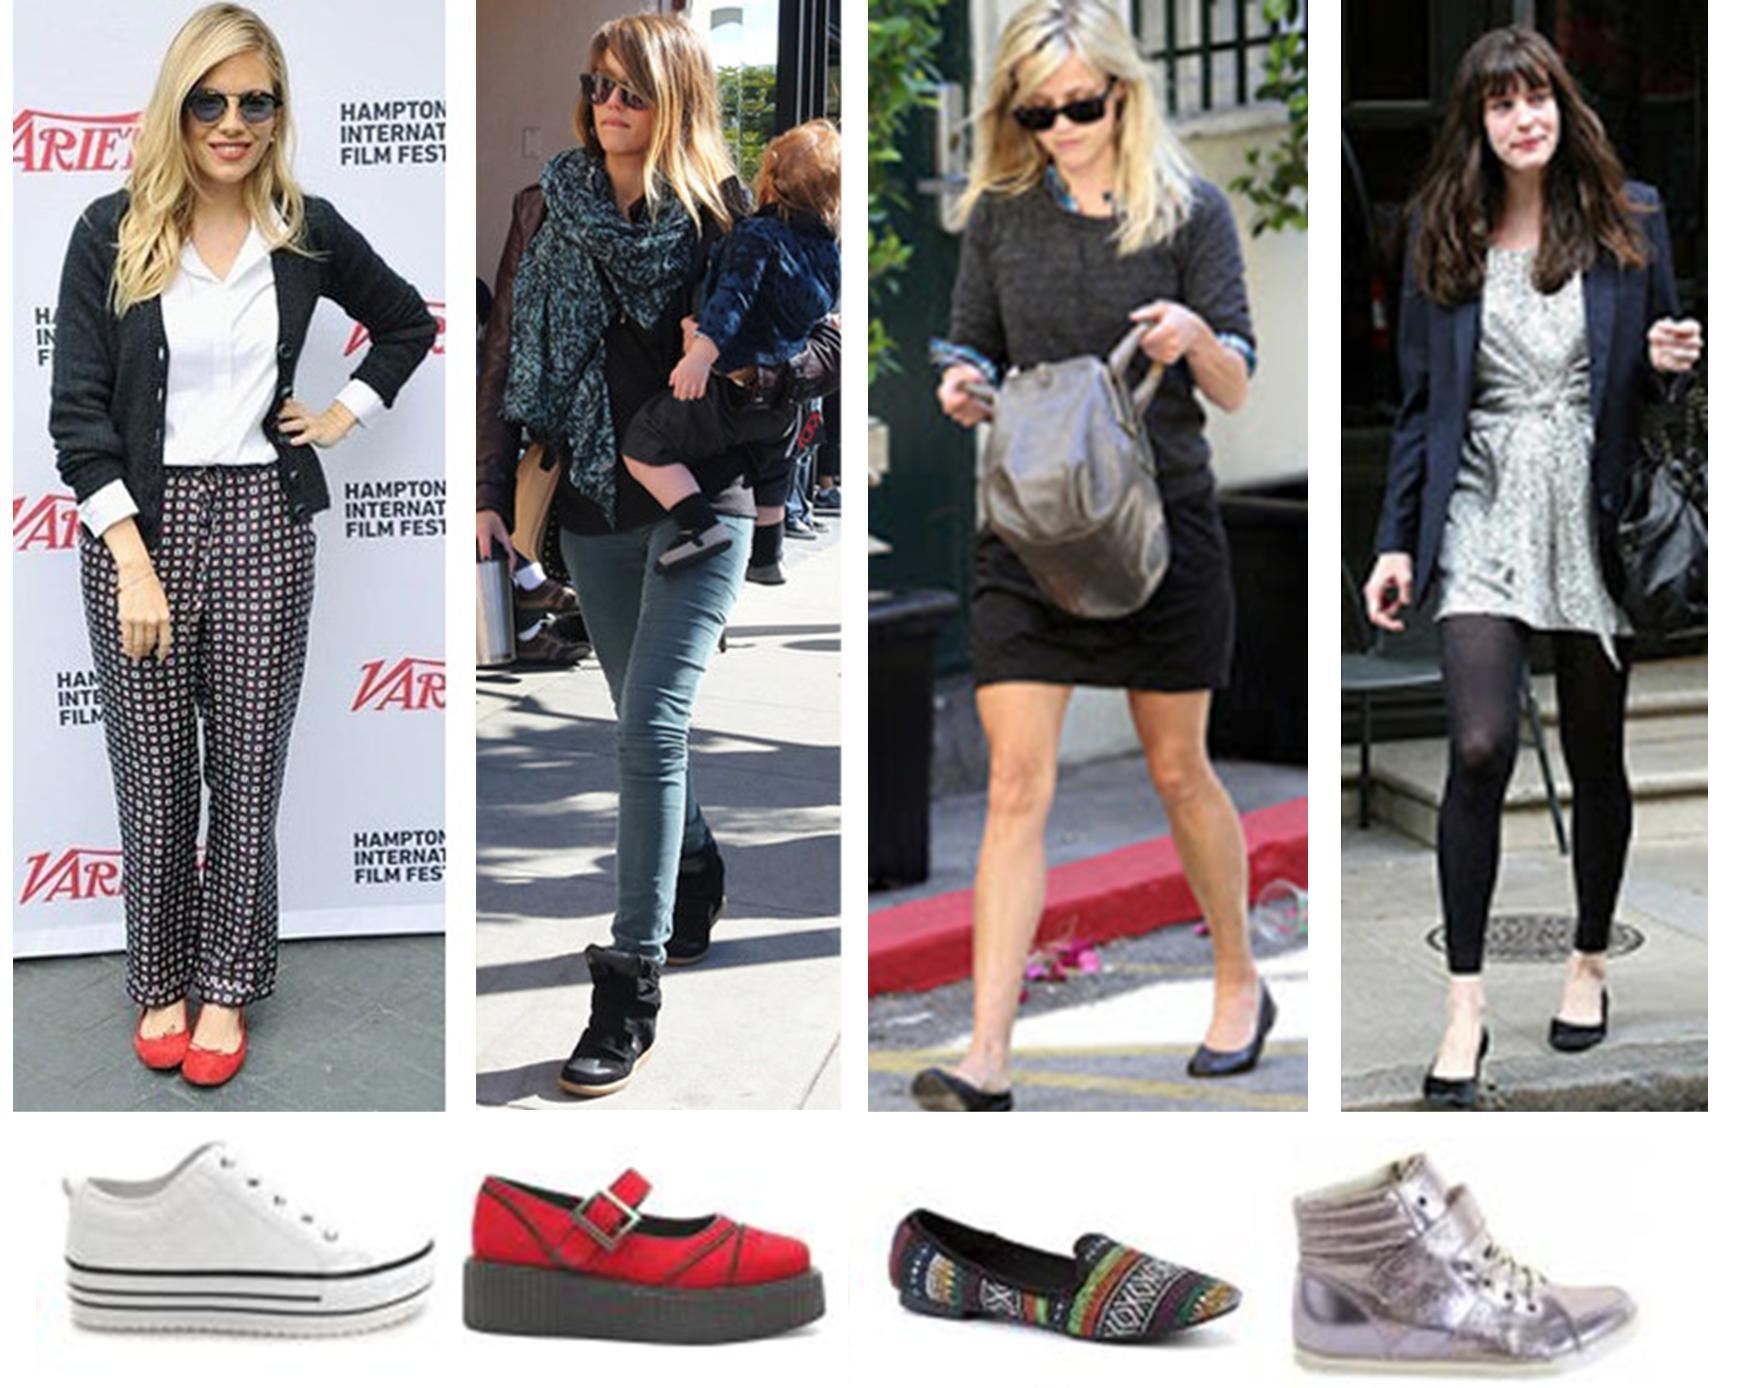 Popular 2019 Celebrity Shoe Trends   Who What Wear